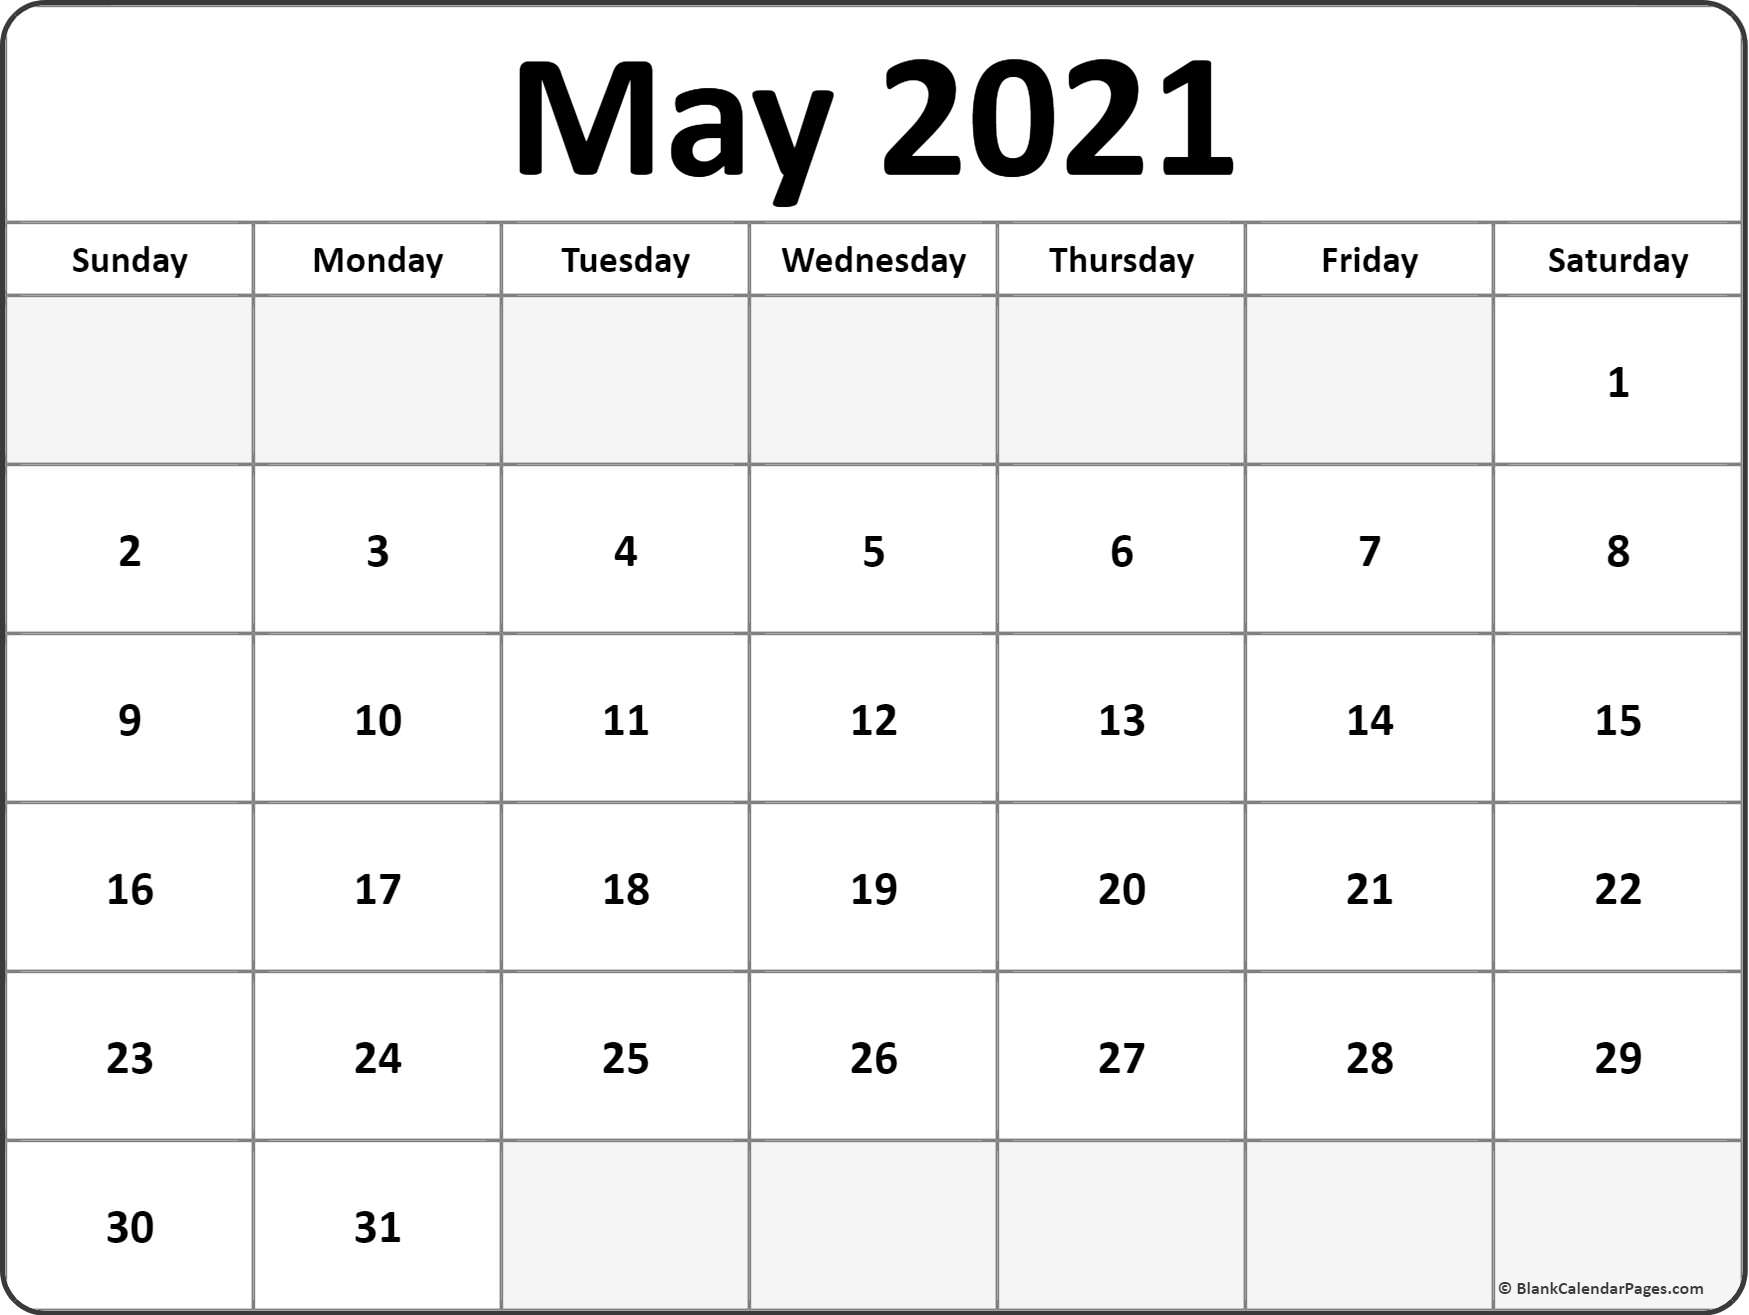 May 2021 Blank Calendar Templates